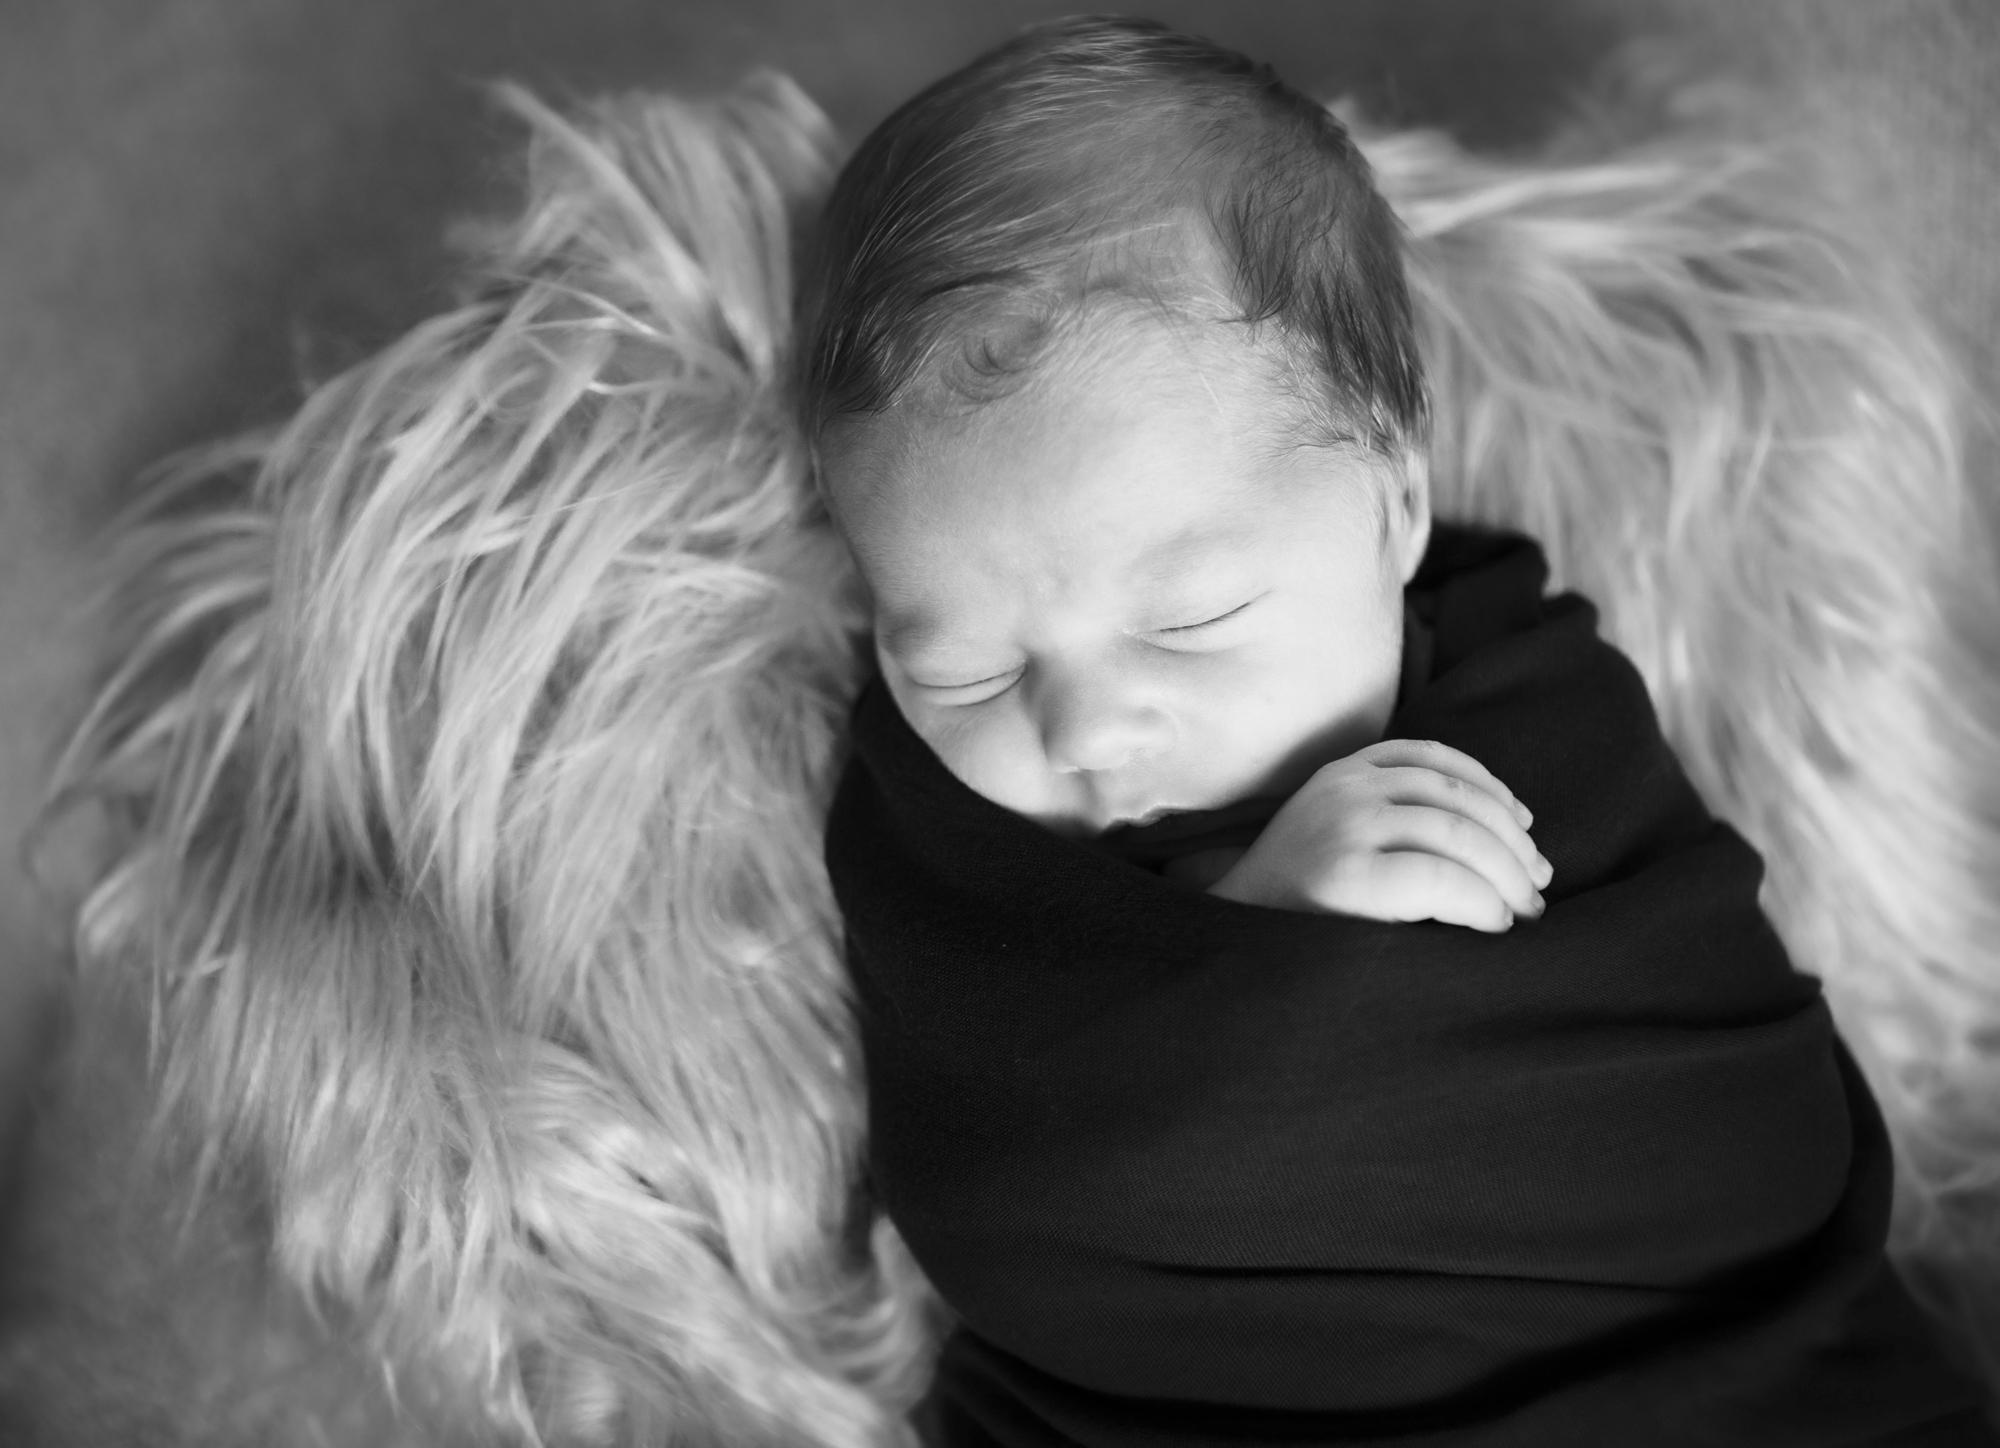 Baby Kyllian Newborn Portrait Session with Studio Misha Photogrpahy_BLOG-11.jpg